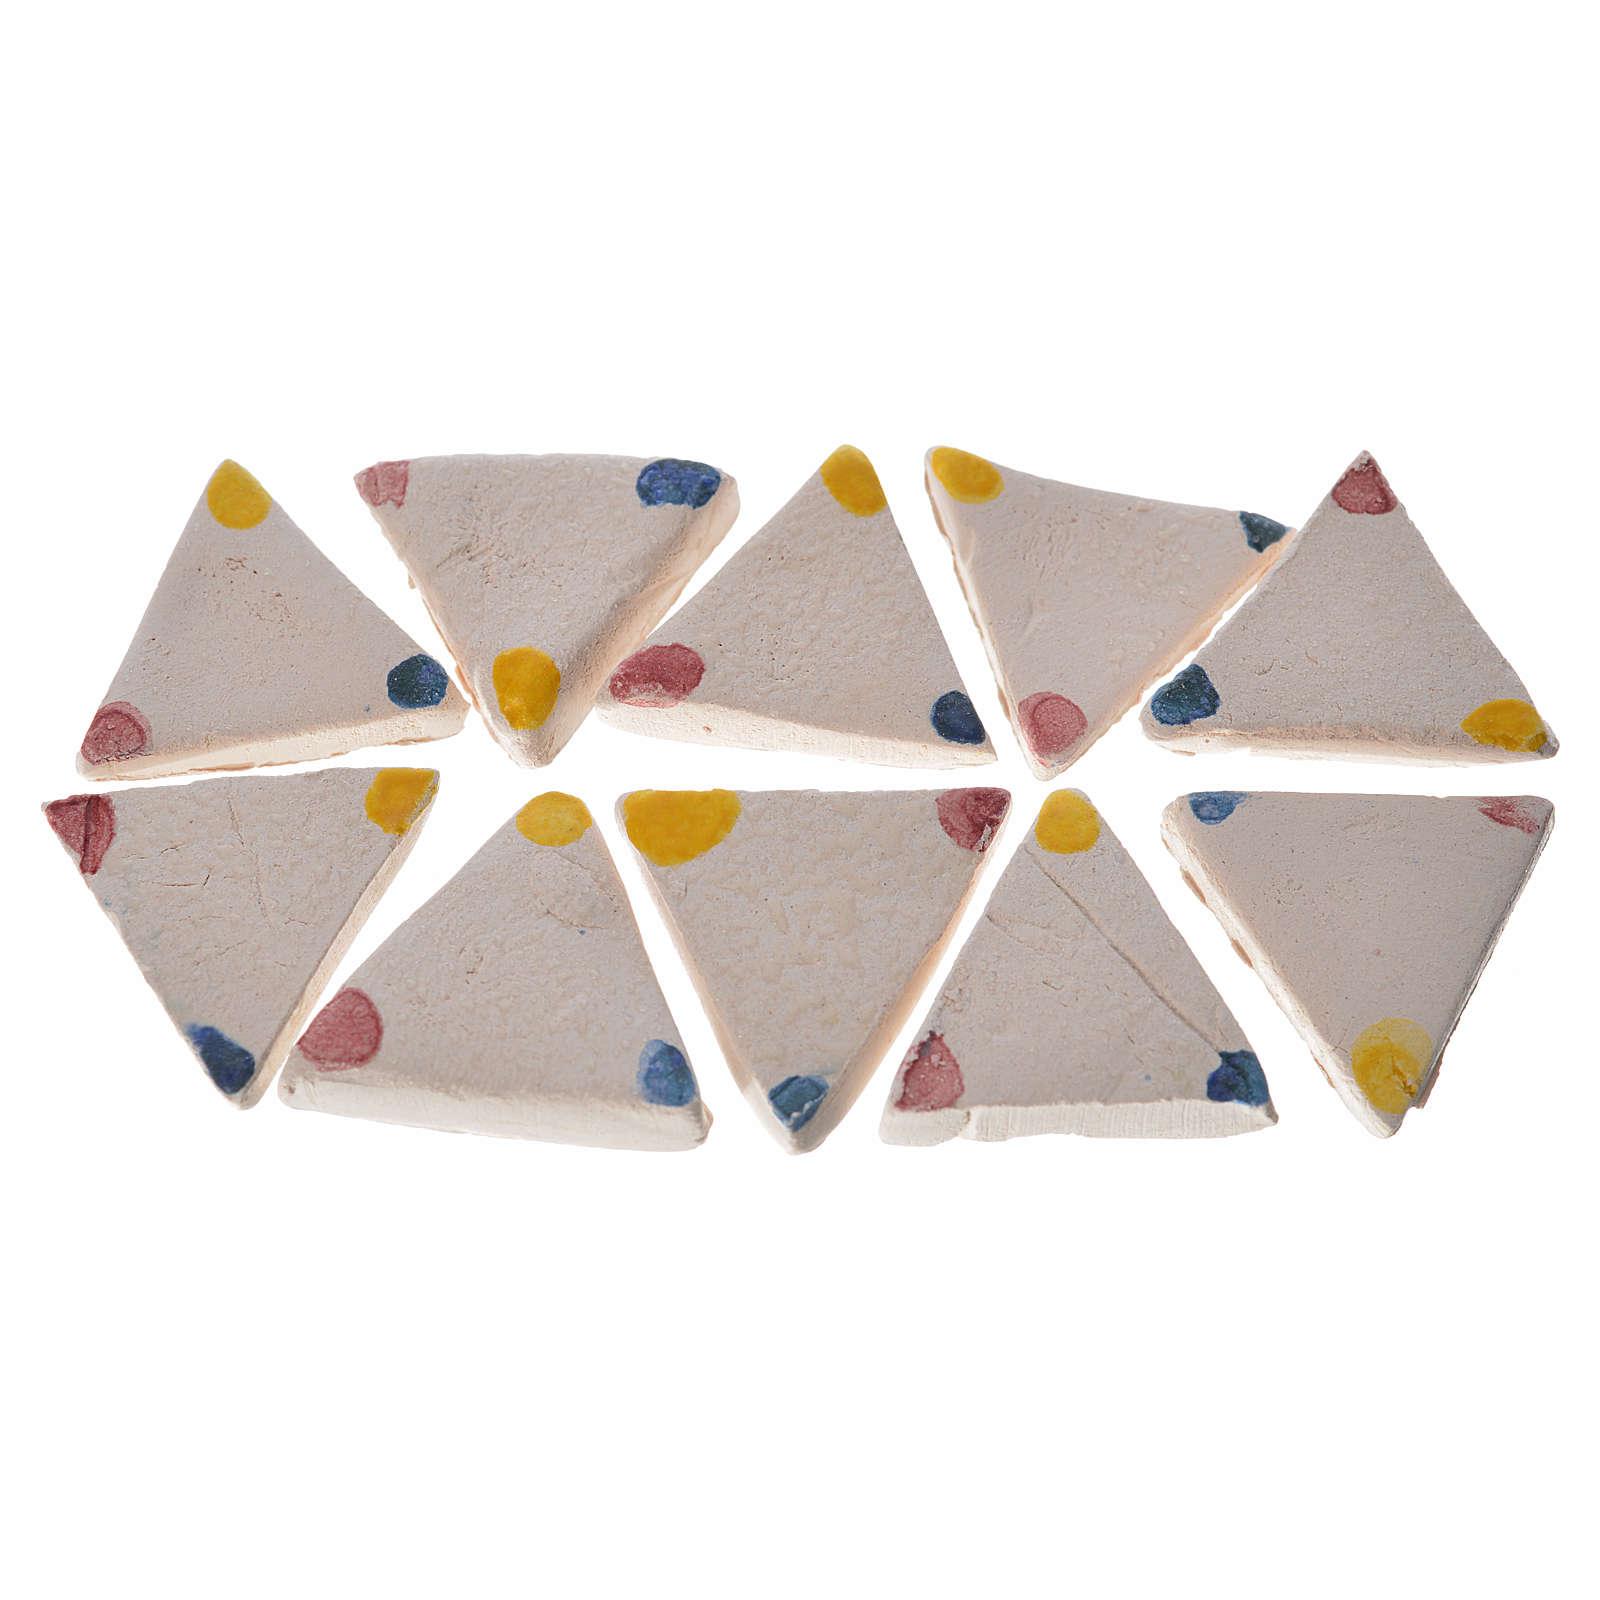 Azulejos de terracota esmaltada, 60pz triangulares puntos multicolores 4